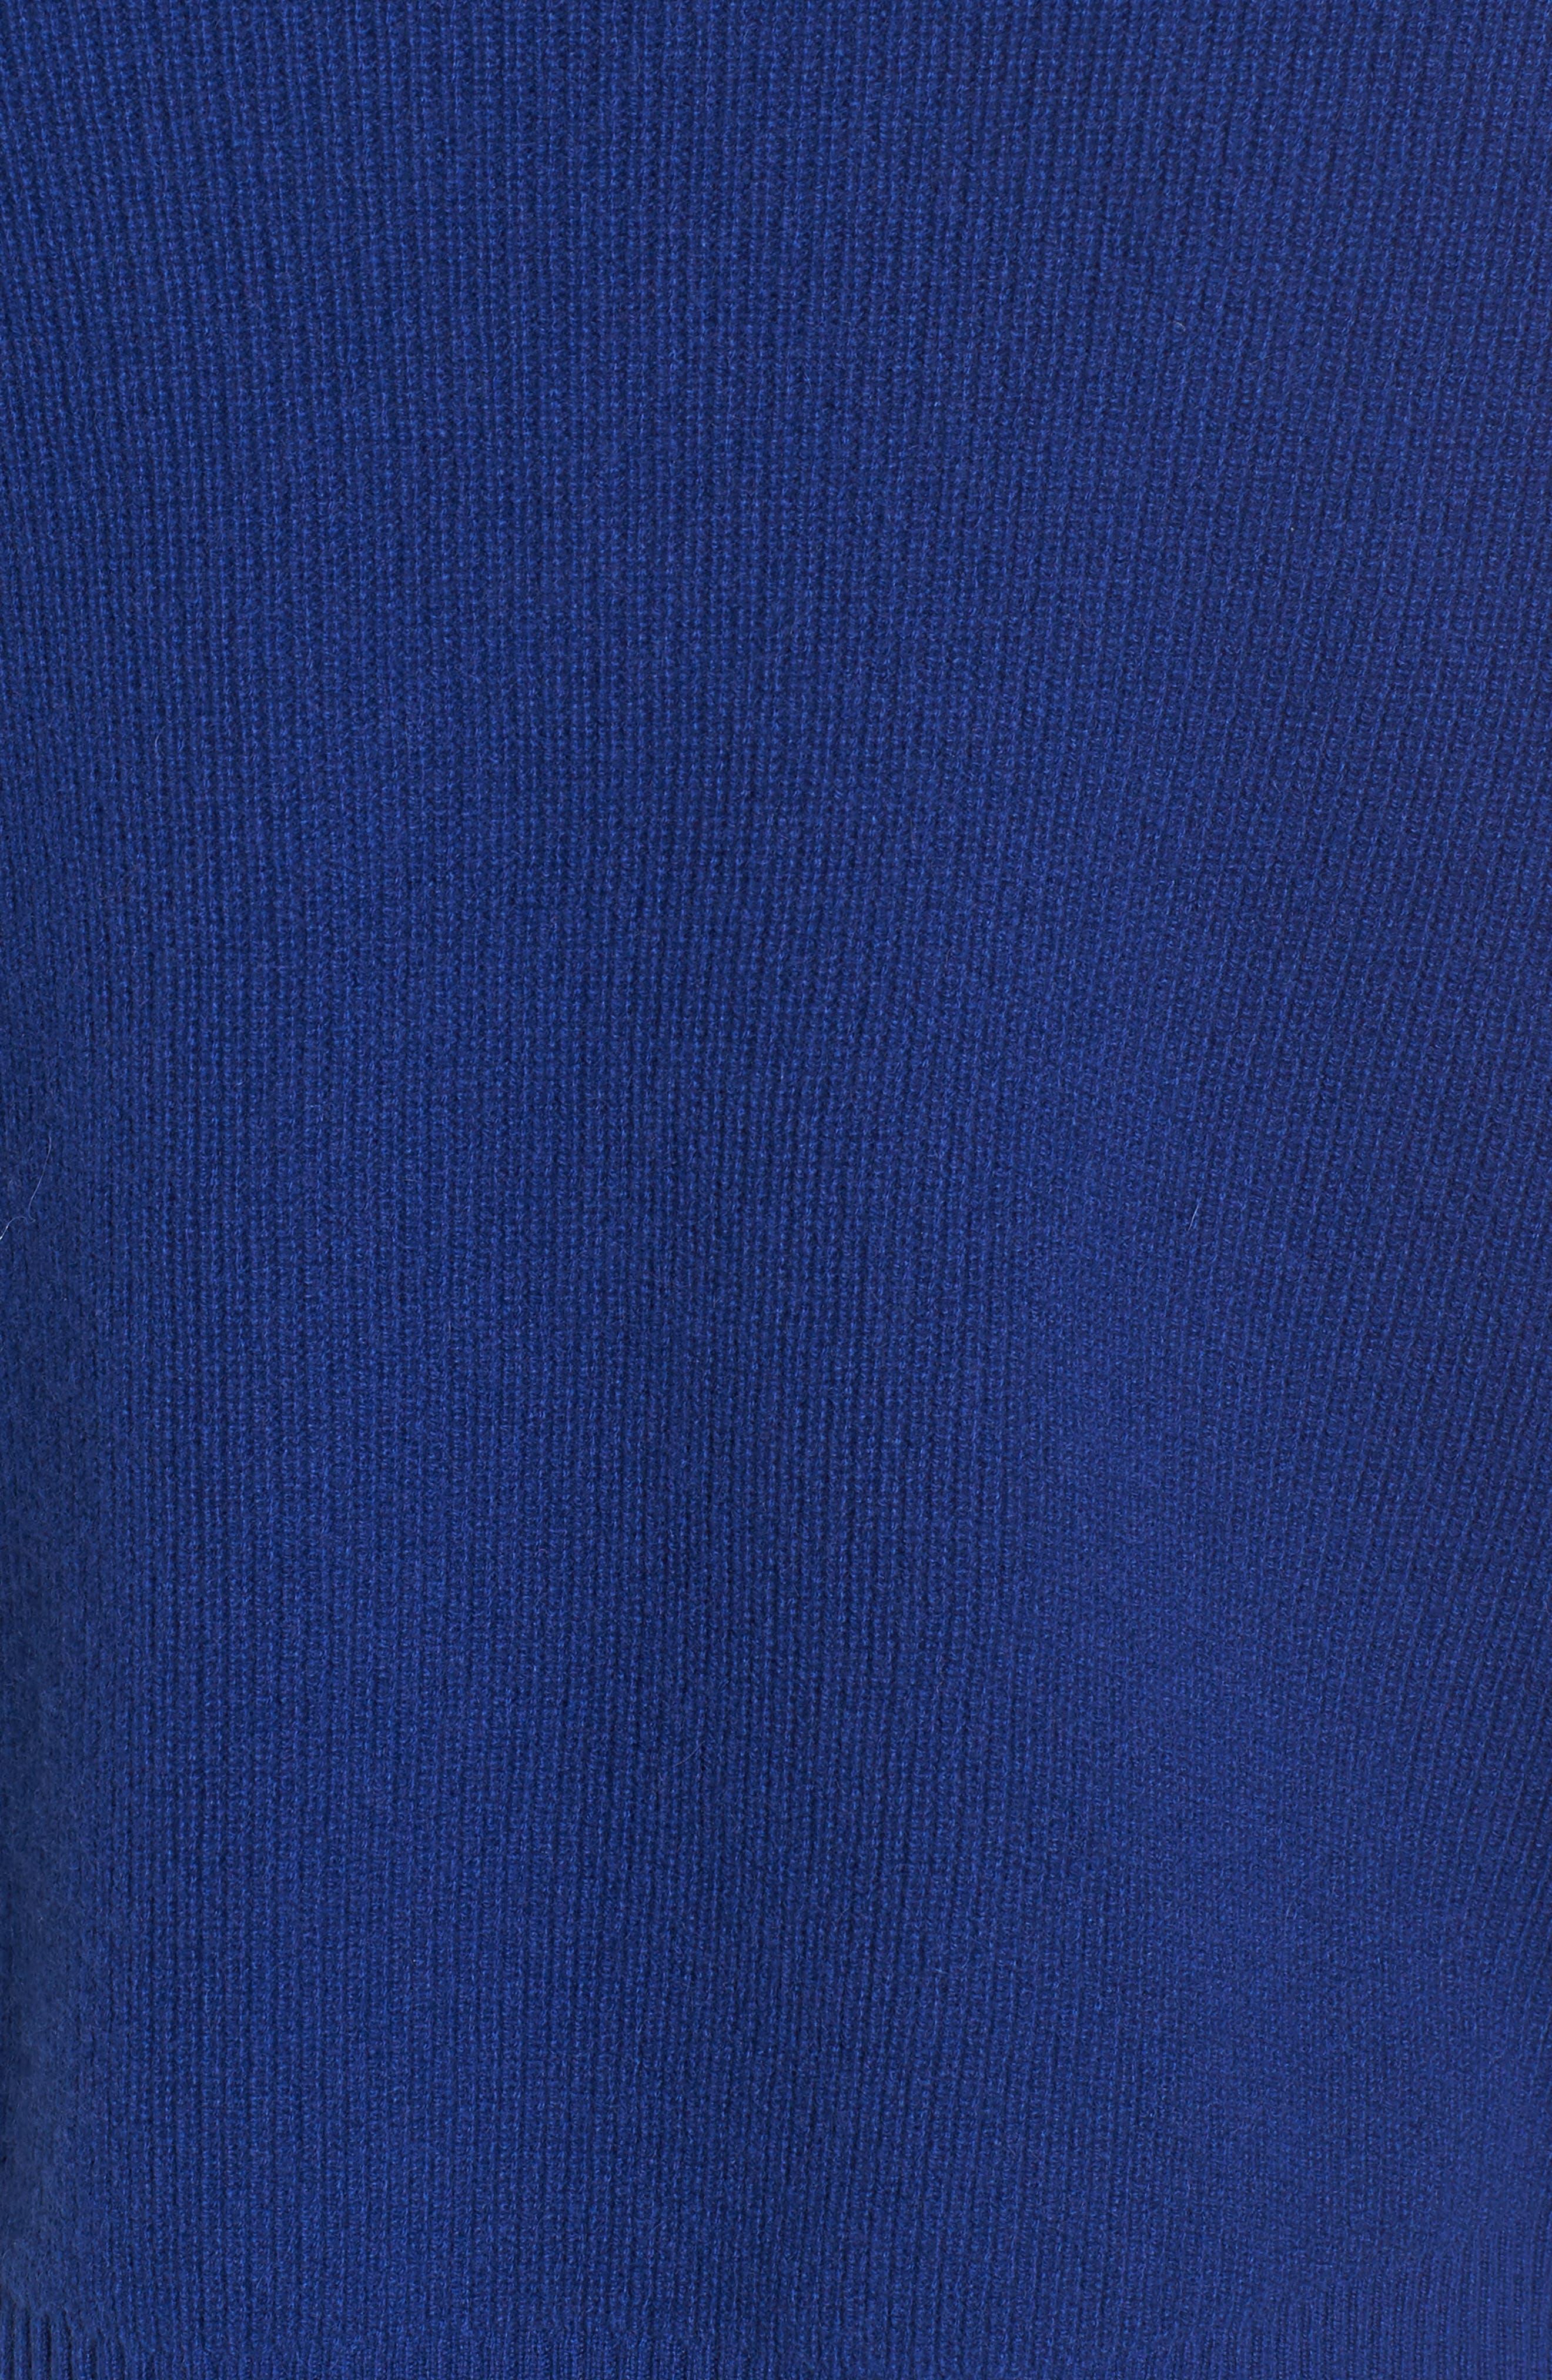 Cashmere Sweater,                             Alternate thumbnail 5, color,                             474